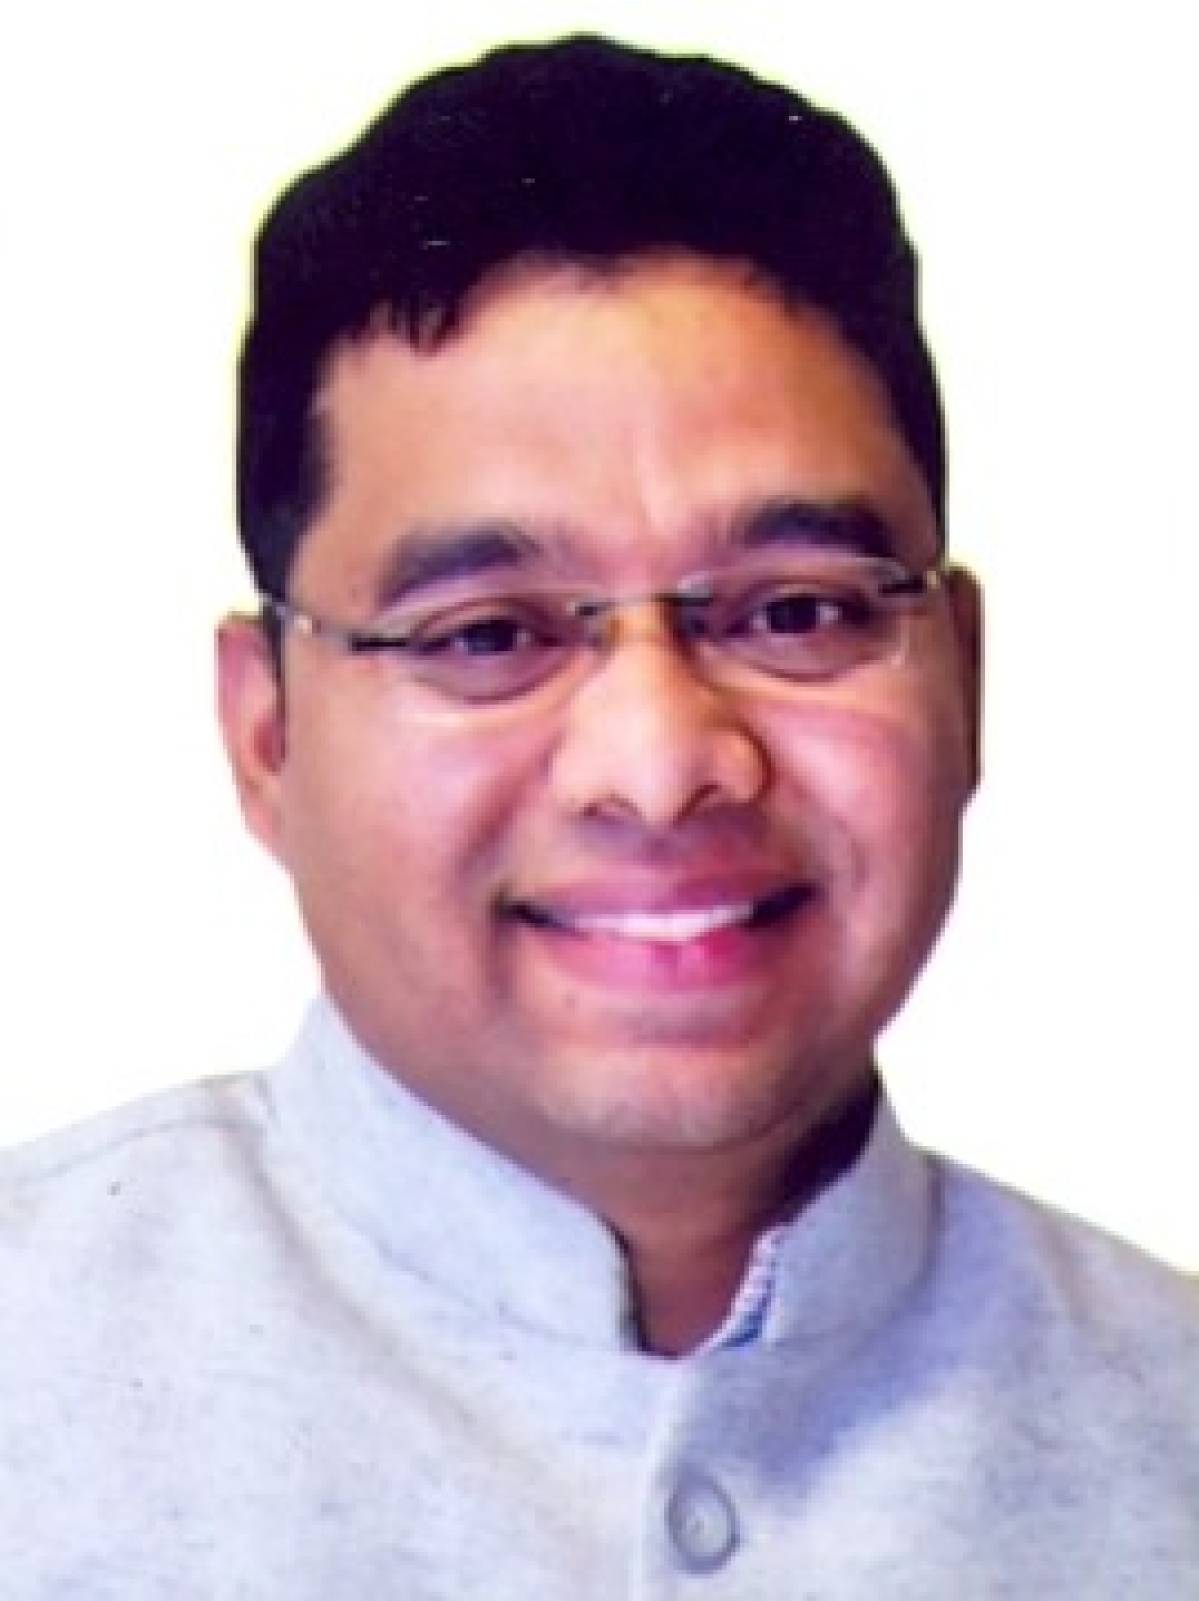 Redress 500-day old public complaints in 7 days: Lokesh Kumar Jatav